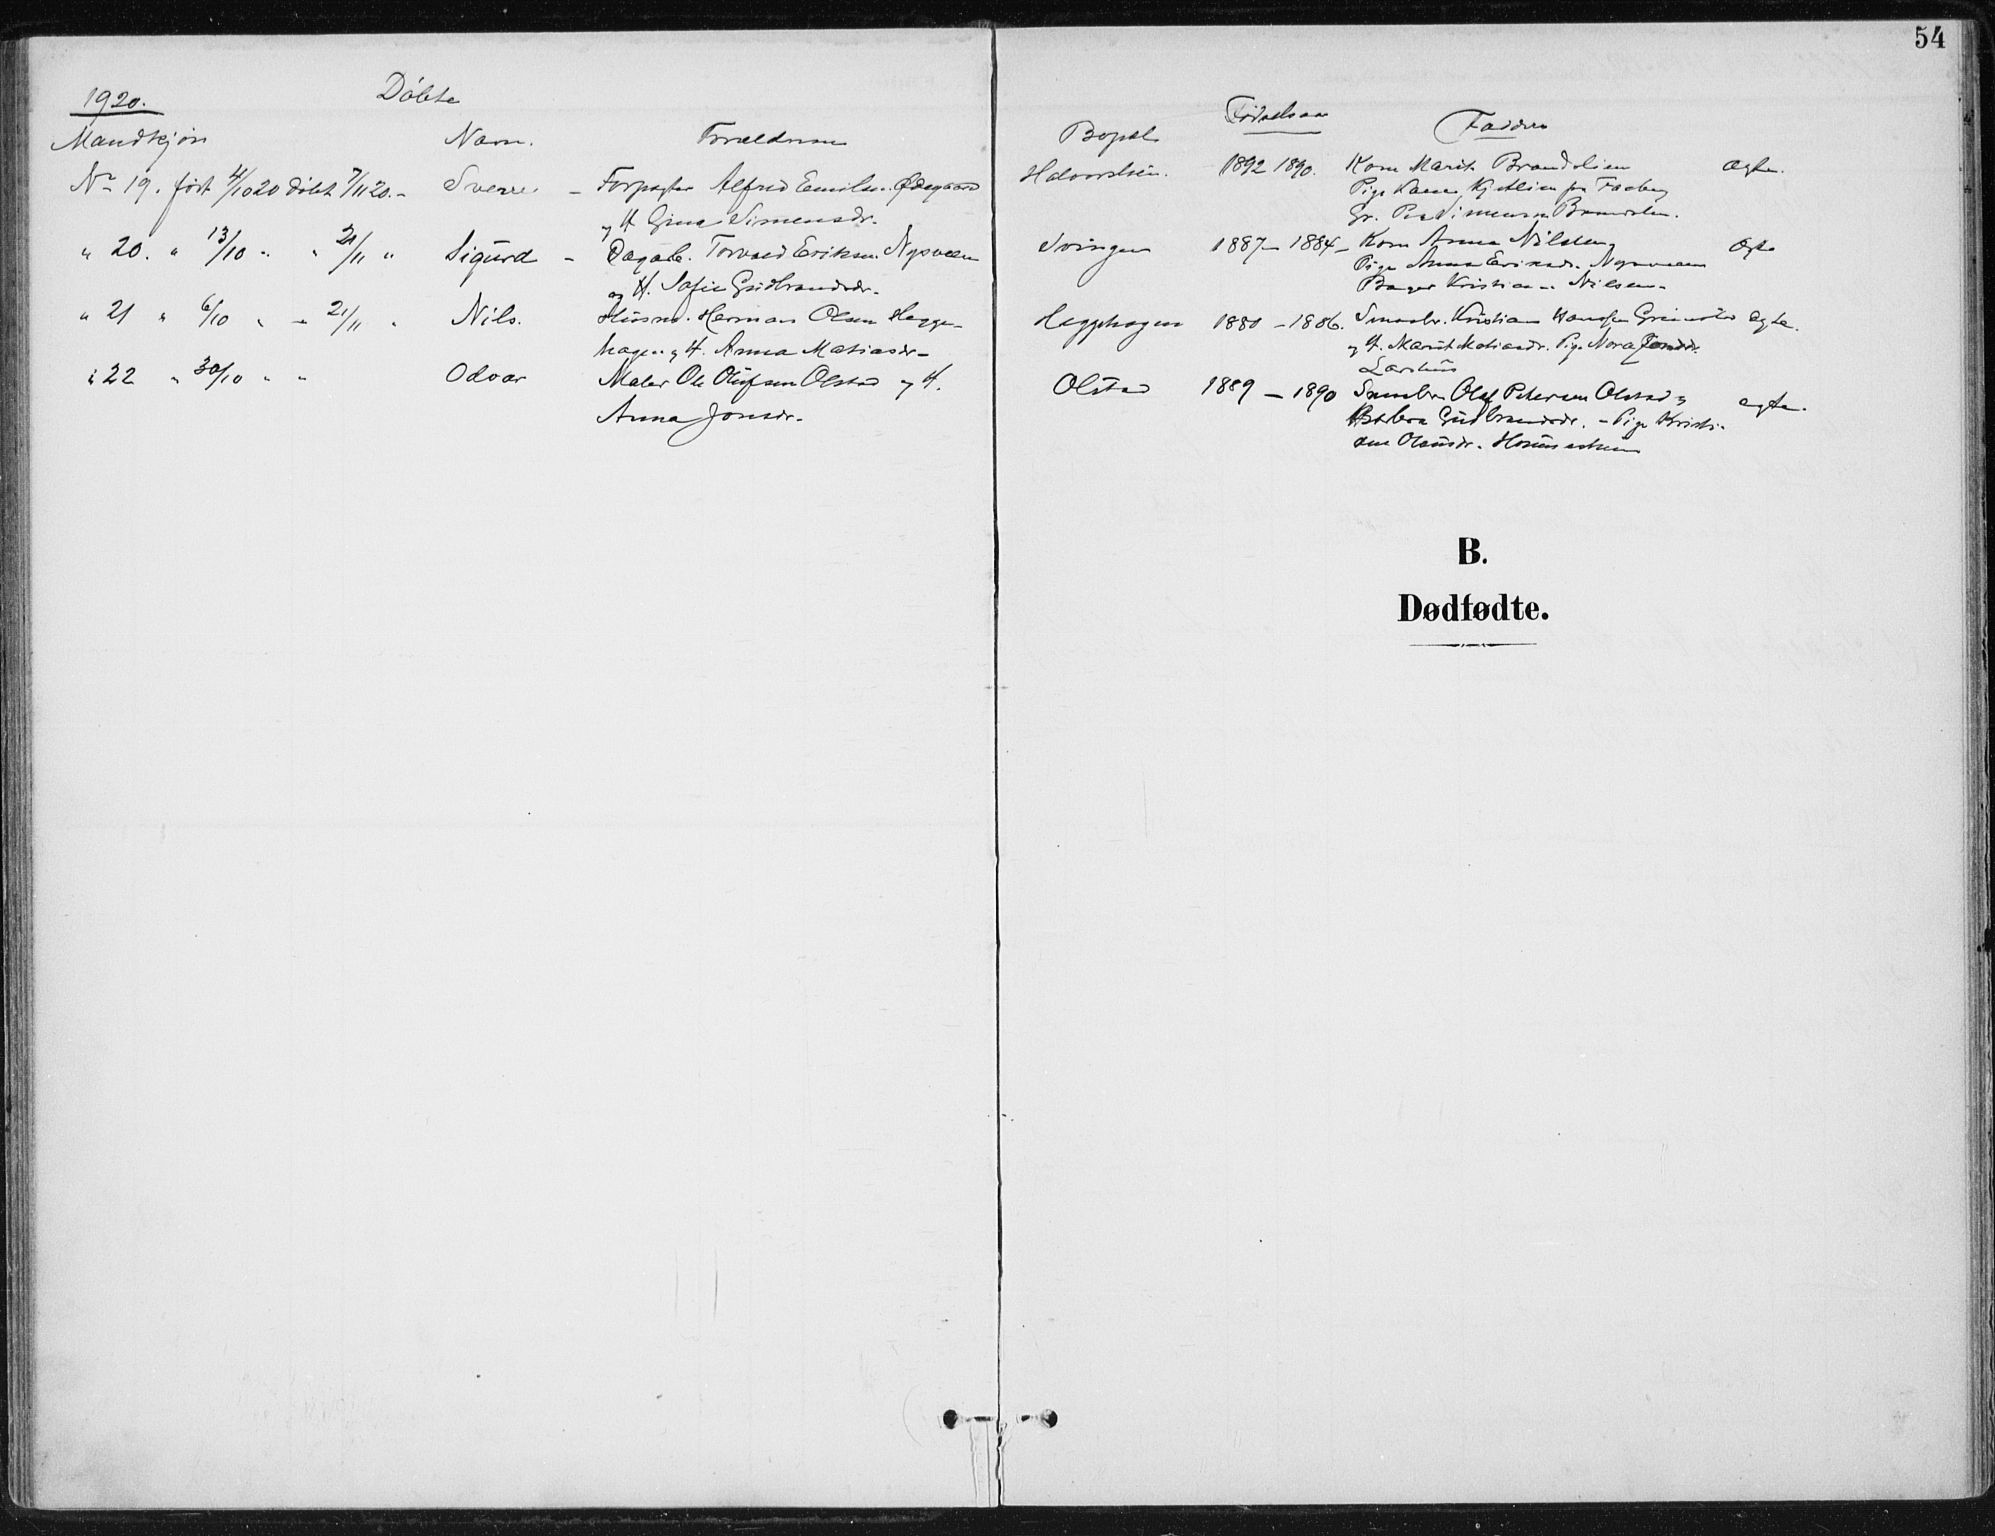 SAH, Østre Gausdal prestekontor, Ministerialbok nr. 5, 1902-1920, s. 54